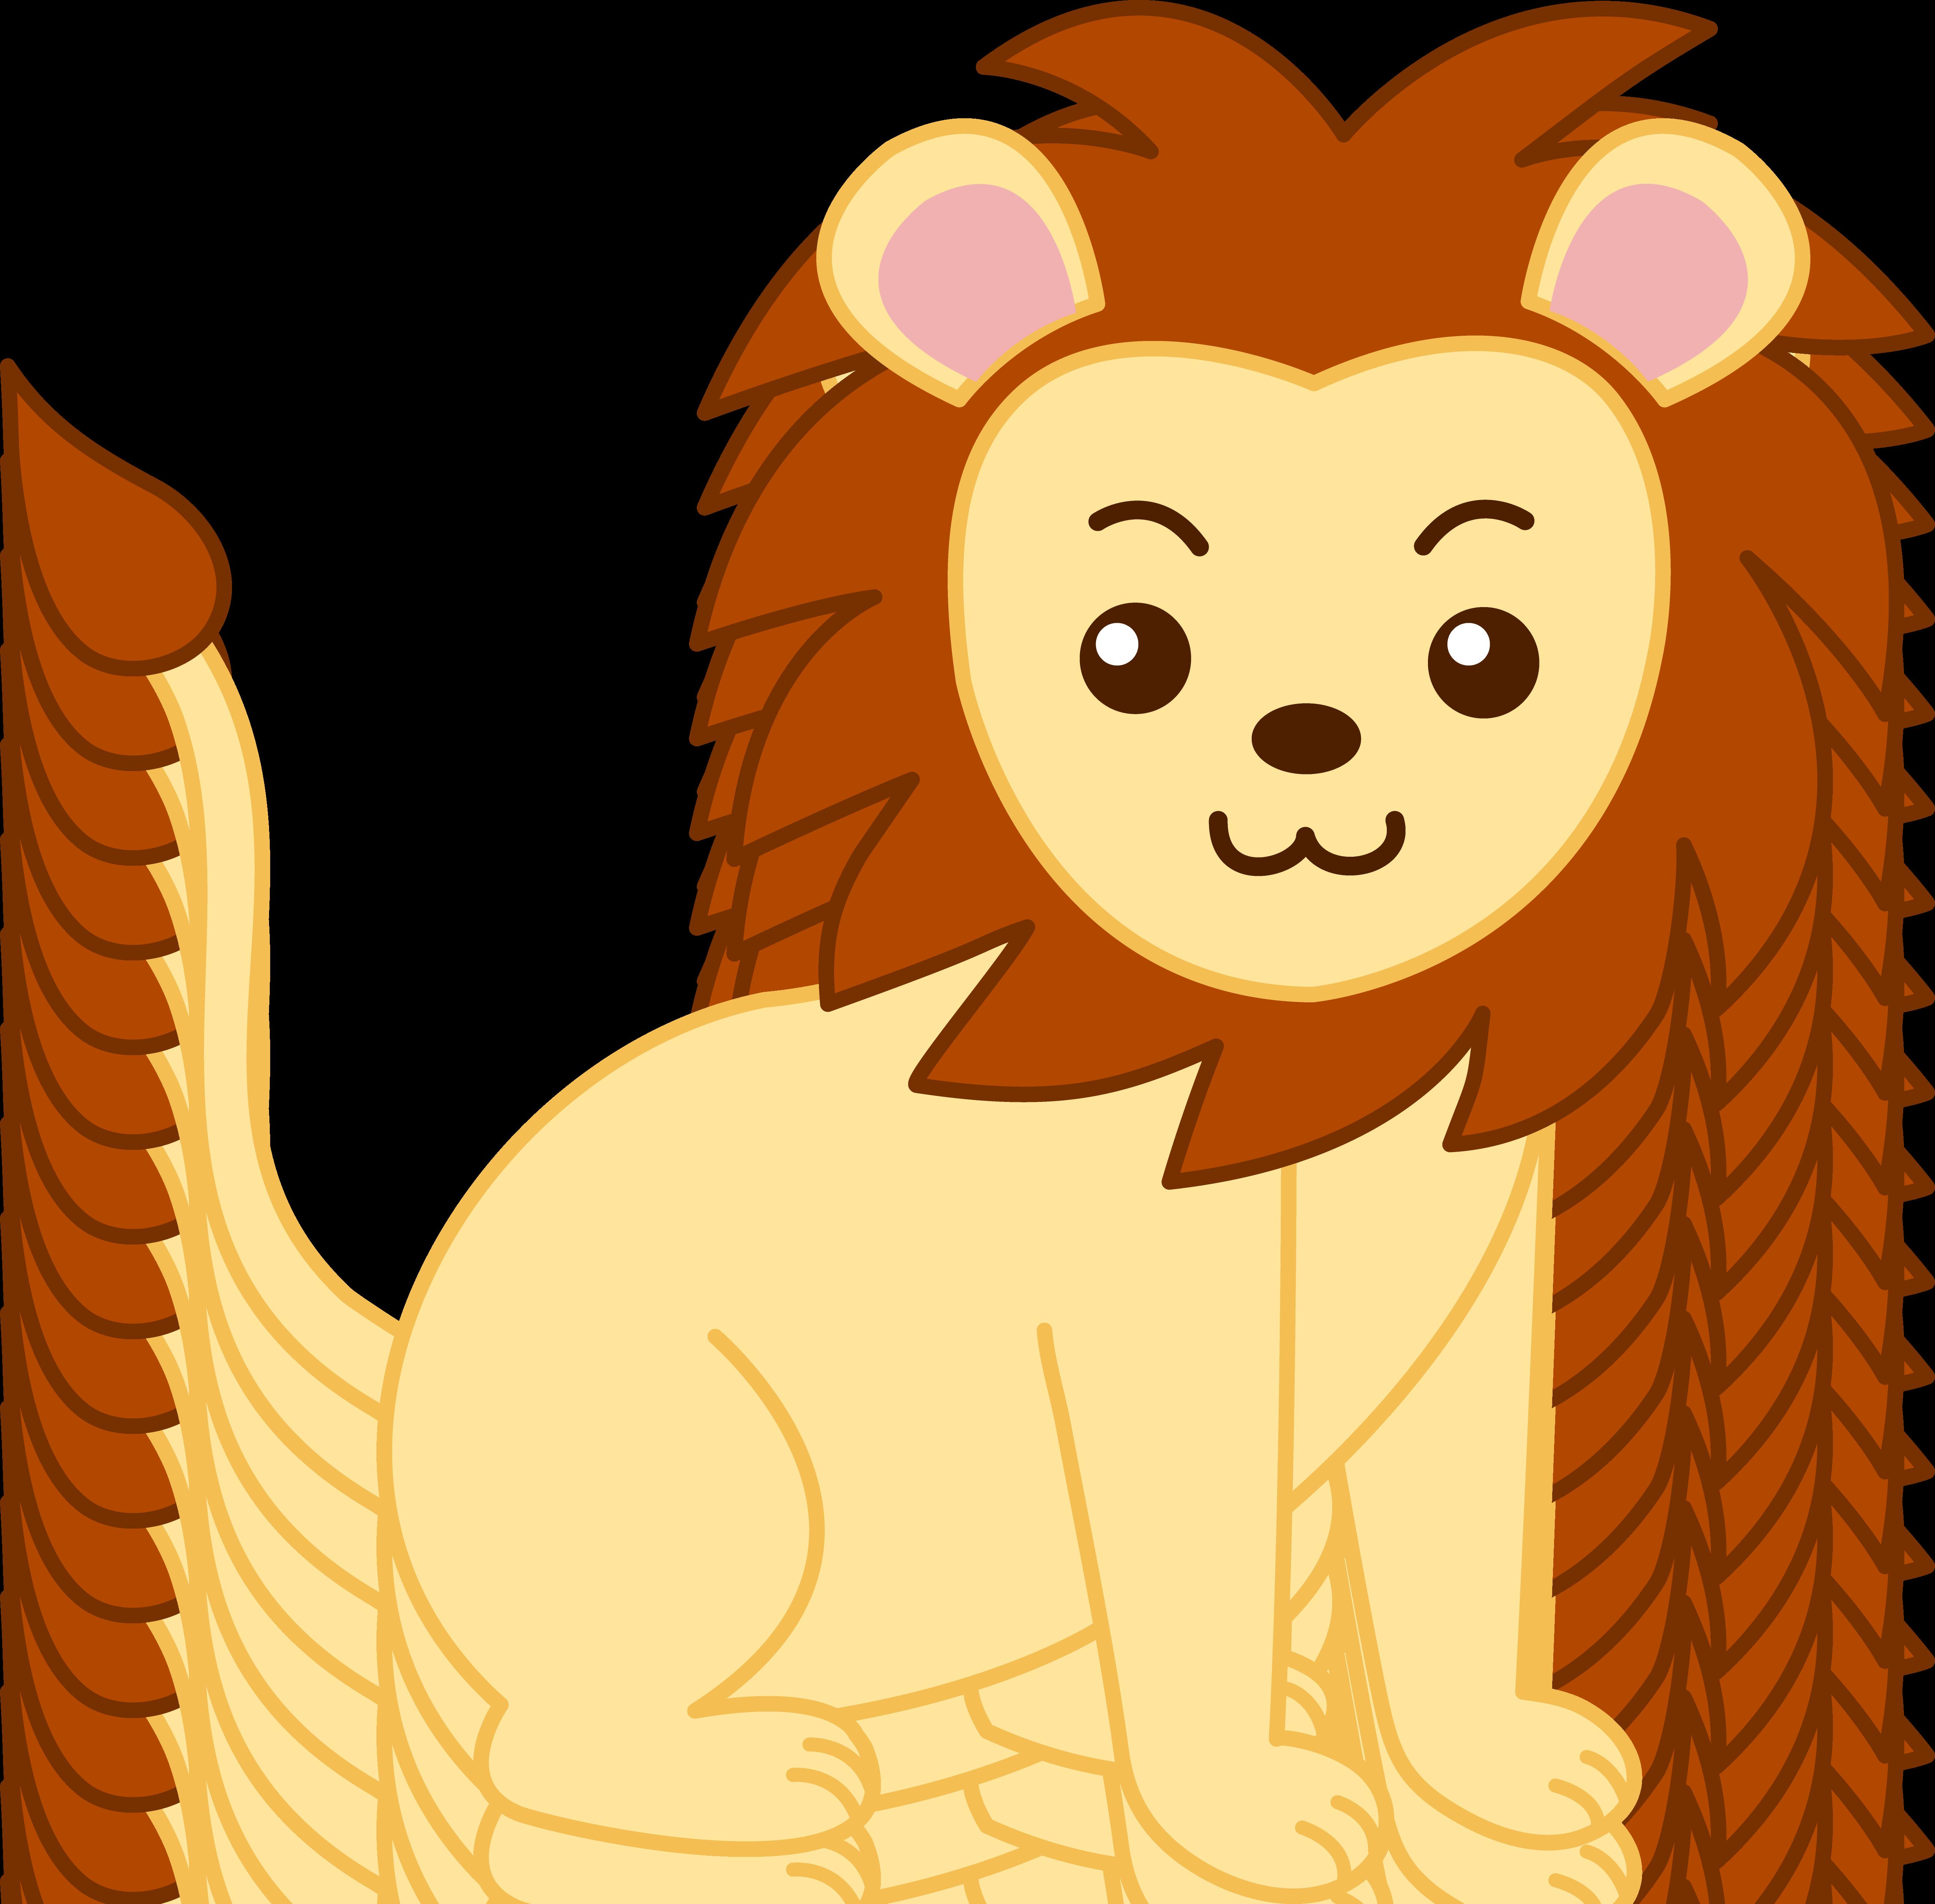 free clipart images lions - photo #17